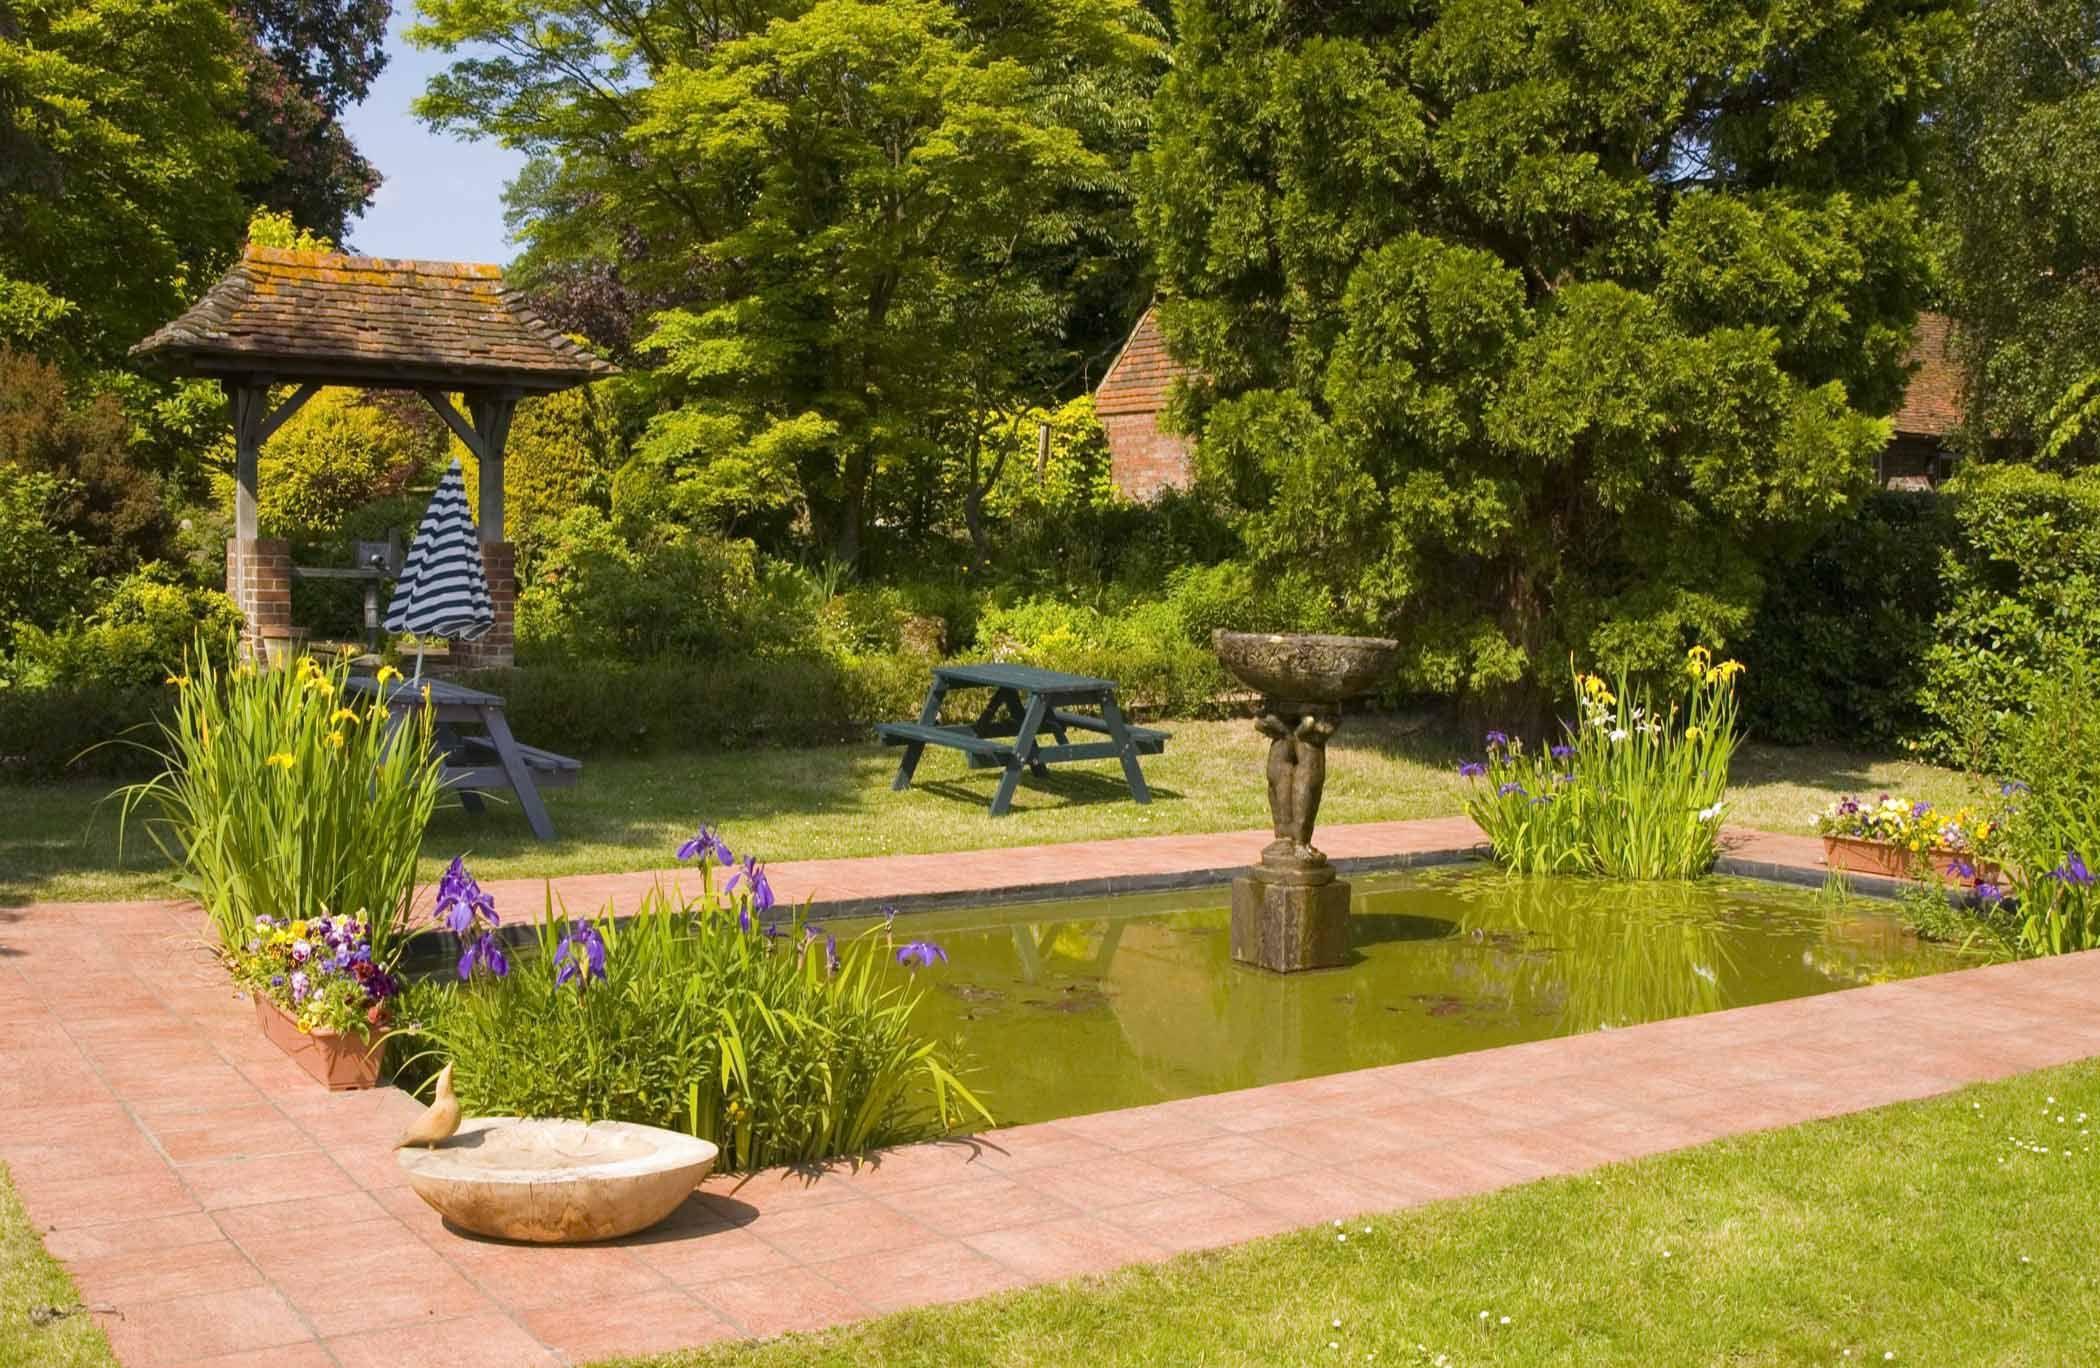 lush green garden ideas | Dream House | Pinterest | Lush green ...